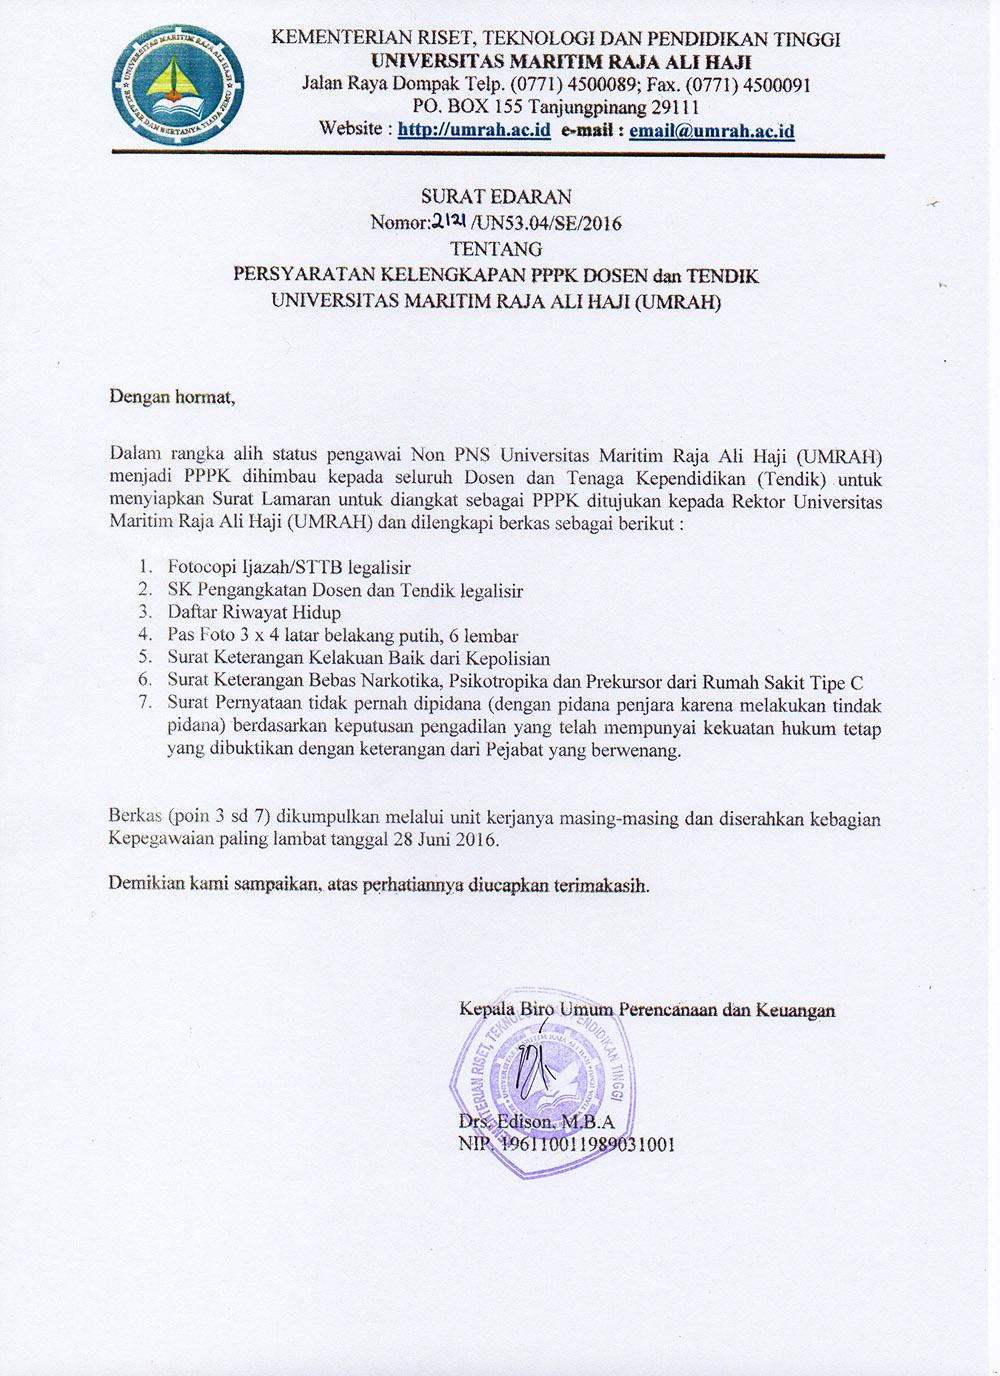 Persyaratan Kelengkapan Pengangkatan PPPK Dosen dan Tenaga Kependidikan